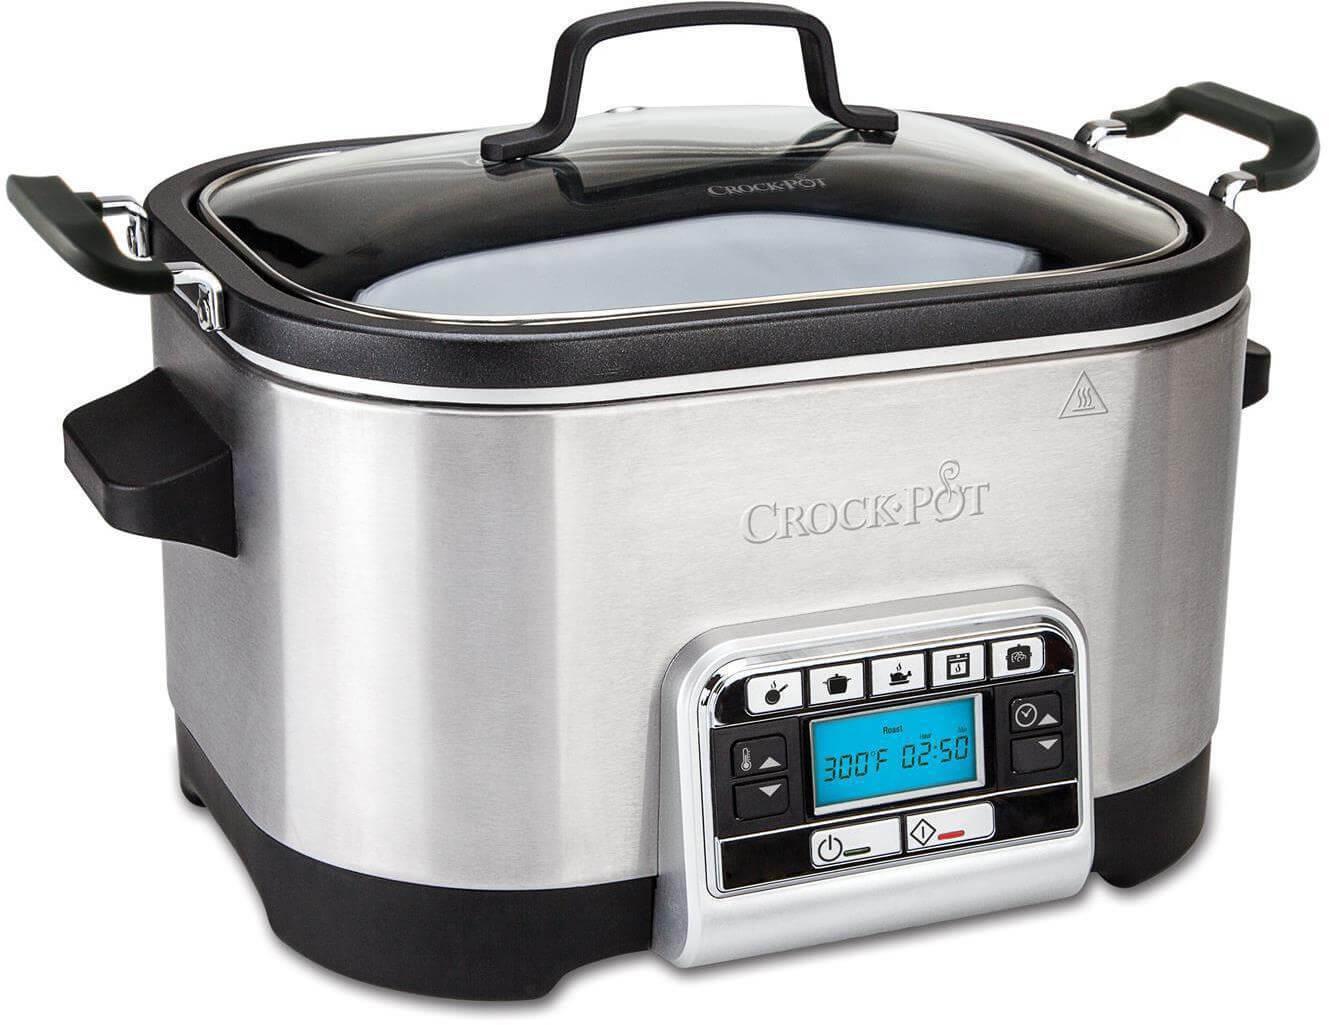 Crock Pot 5,6 L Multi Cooker